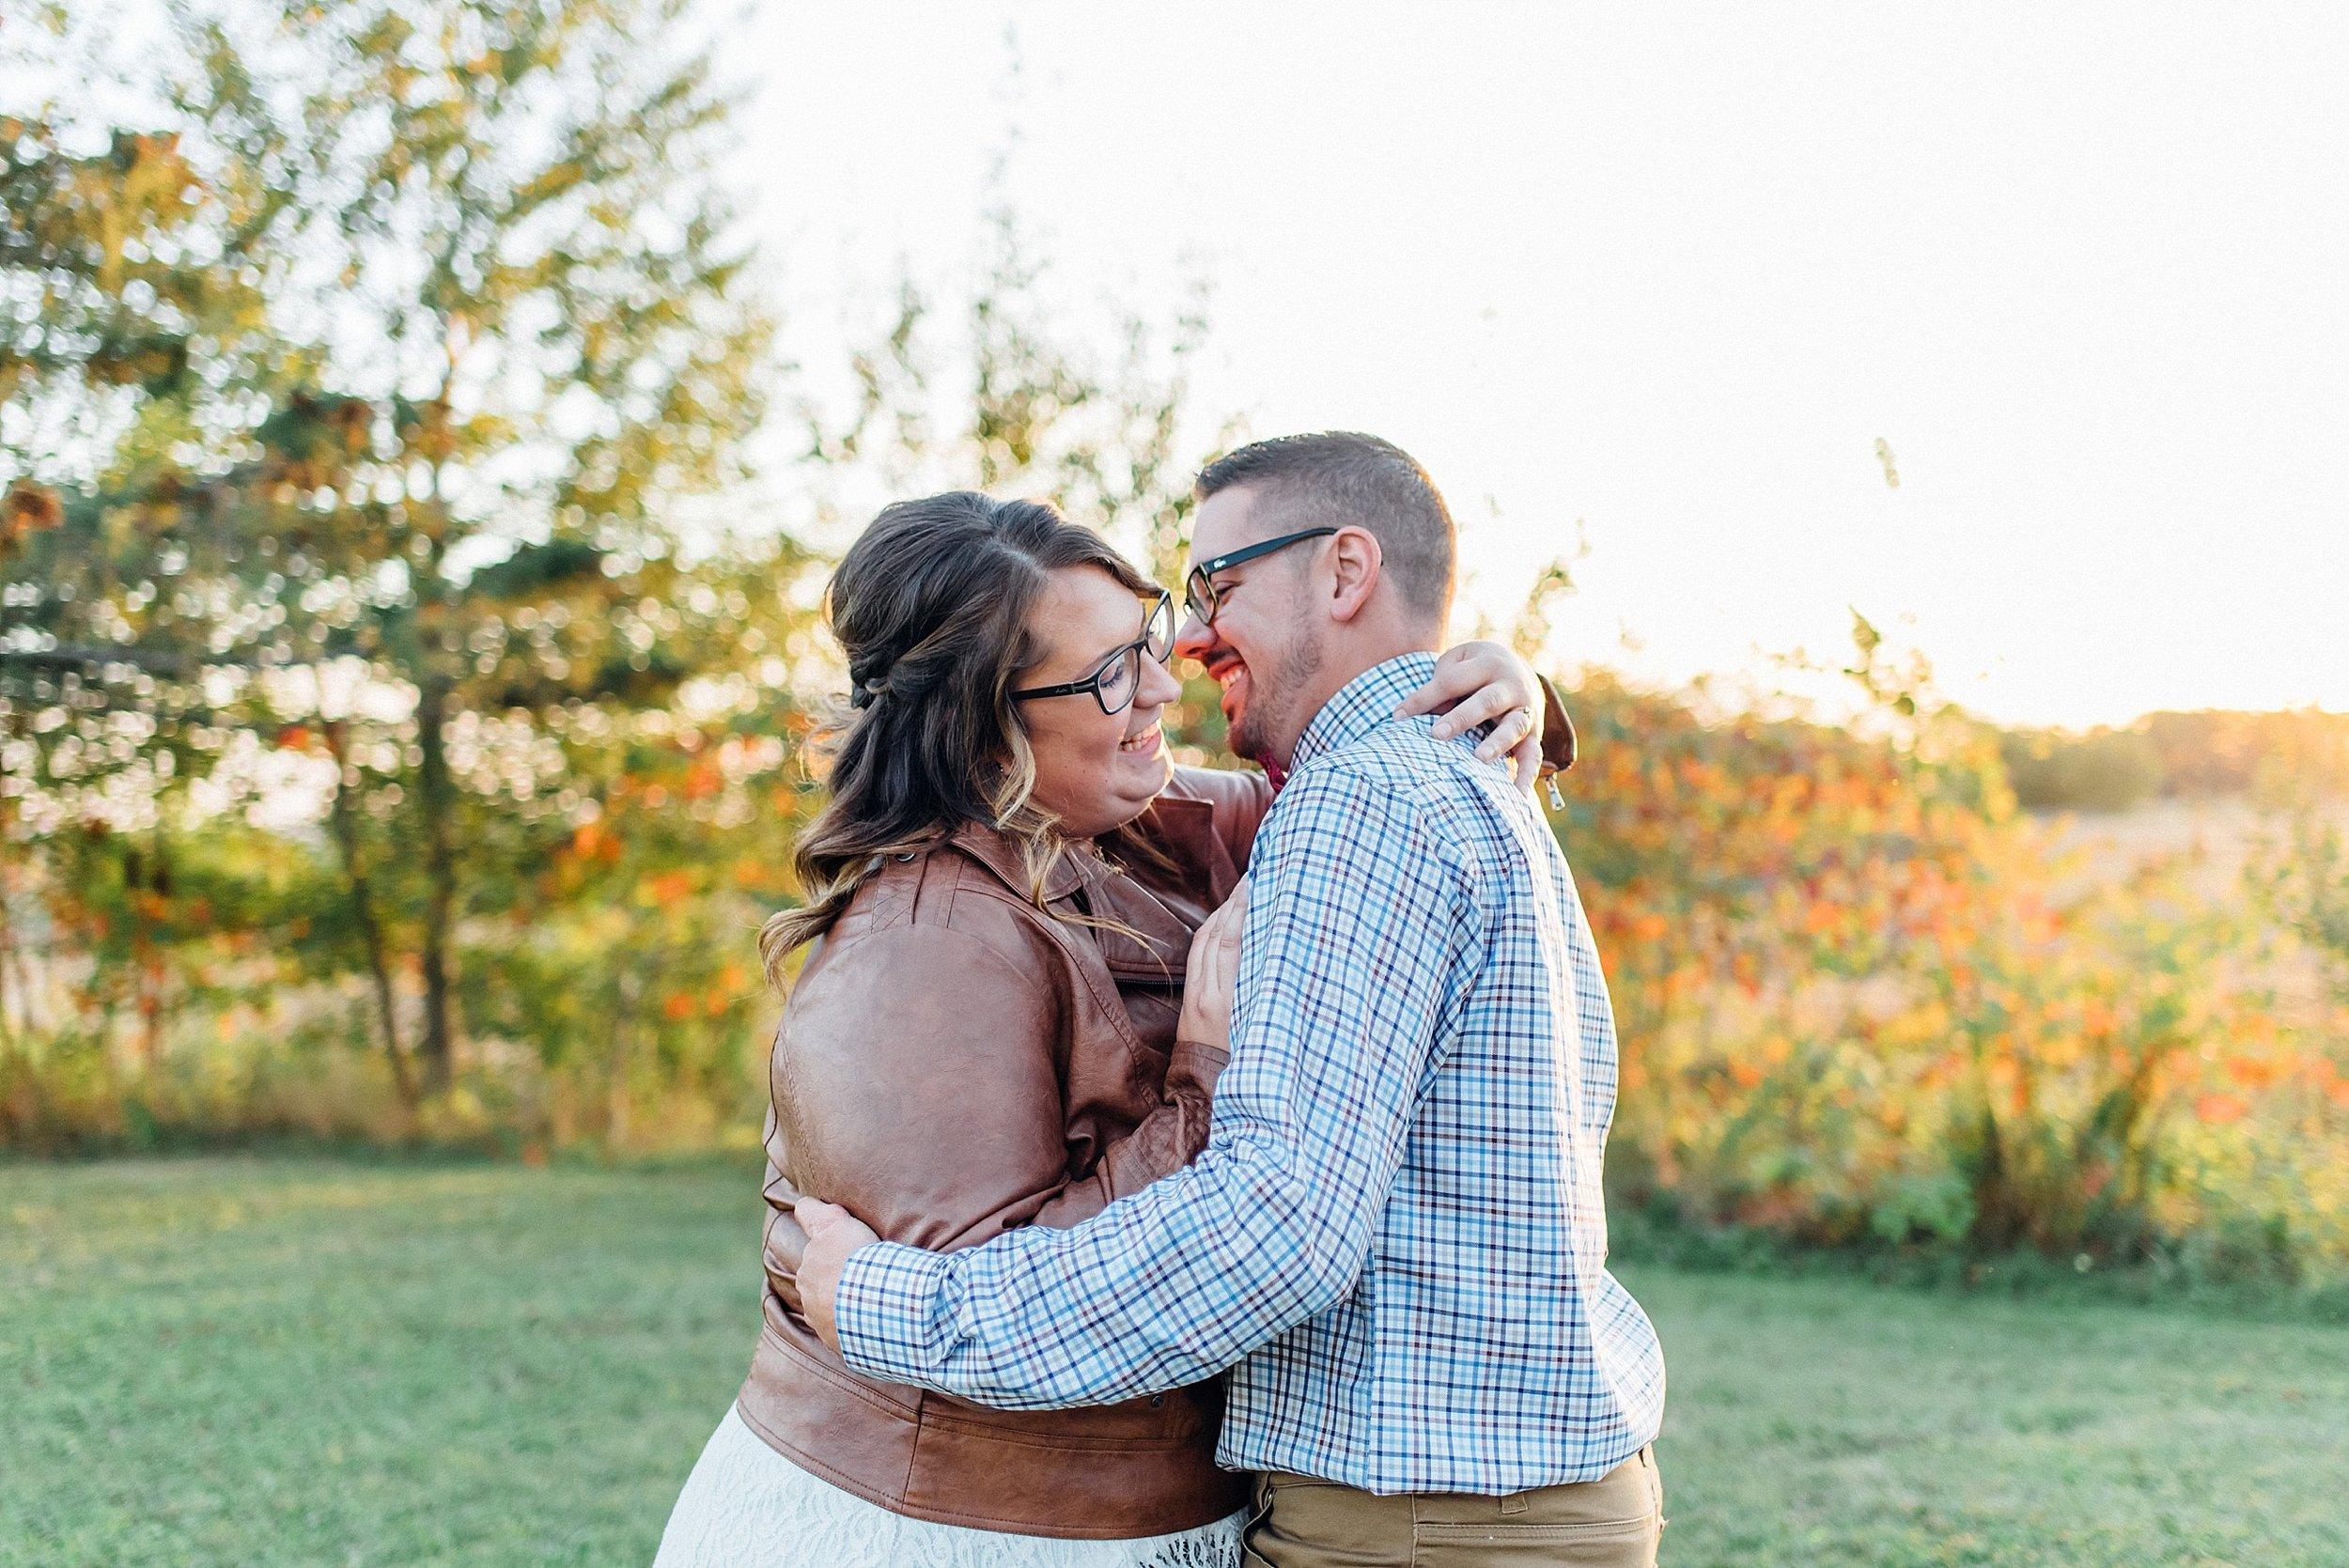 Ali and Batoul Photography - light, airy, indie documentary Ottawa wedding photographer_0173.jpg